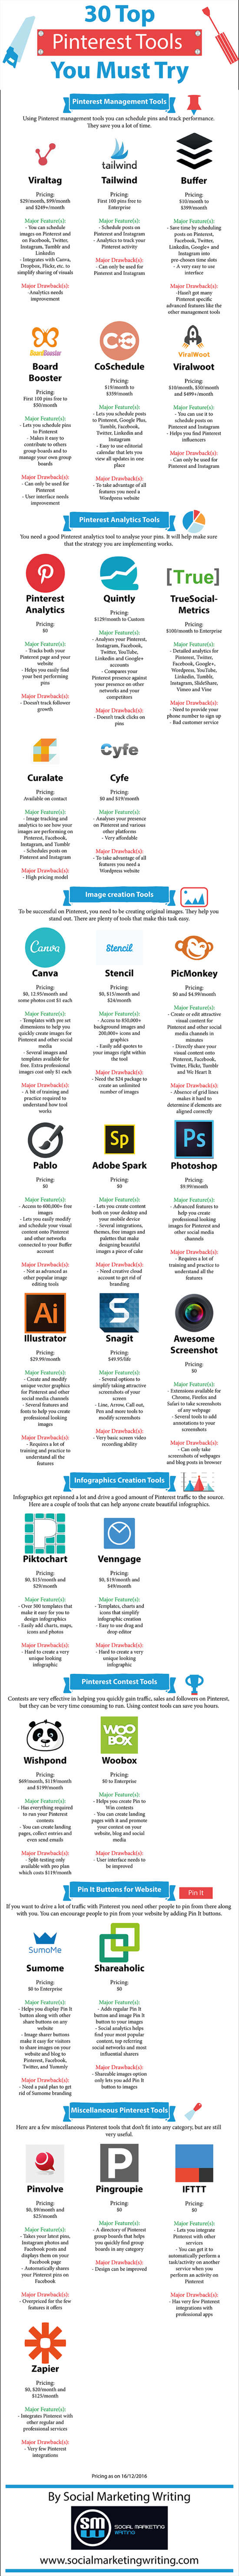 herramientas-pinterest-negocio-infografia